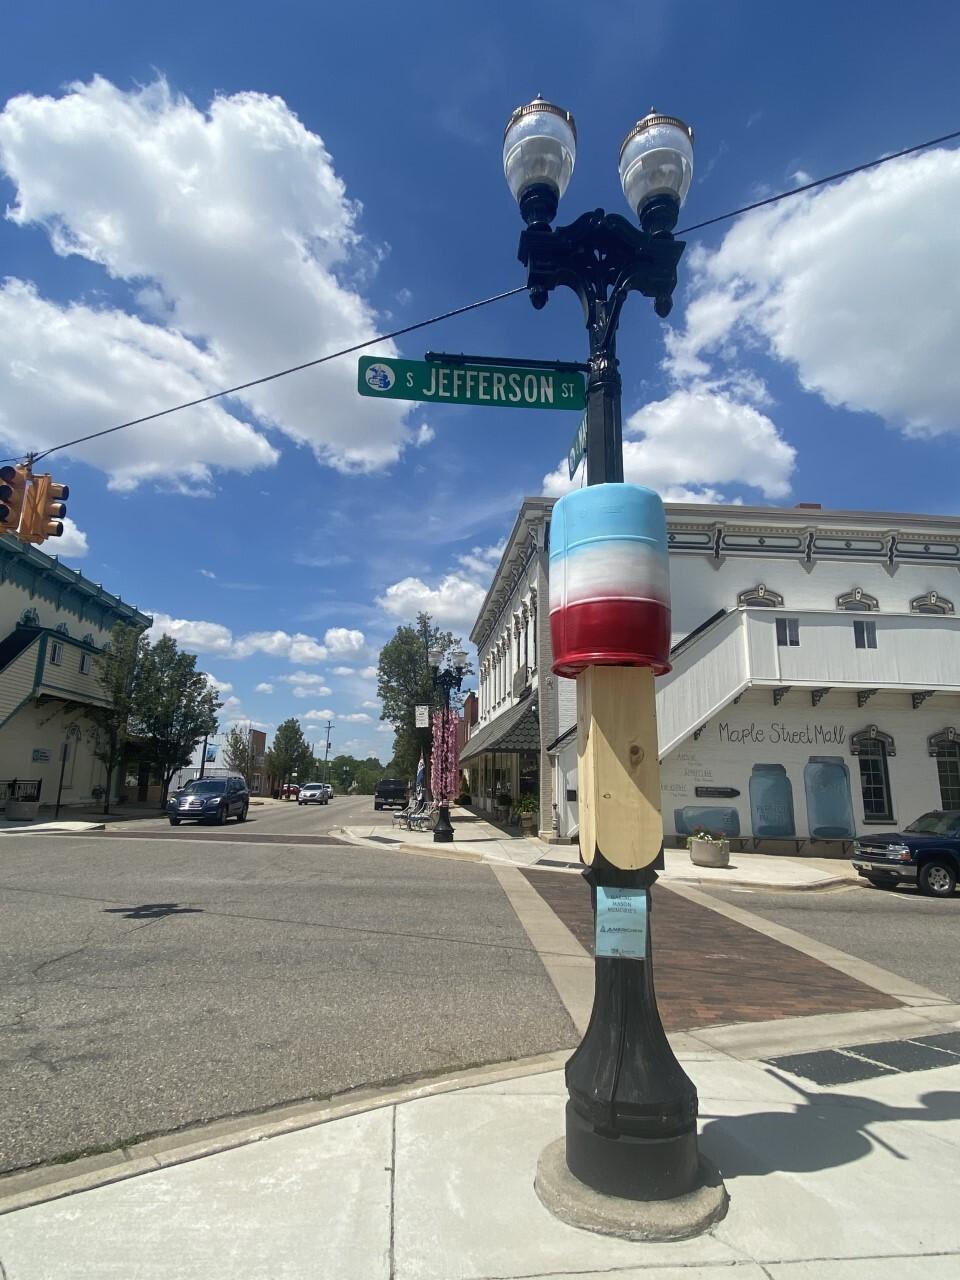 A light pole or a summer treat?